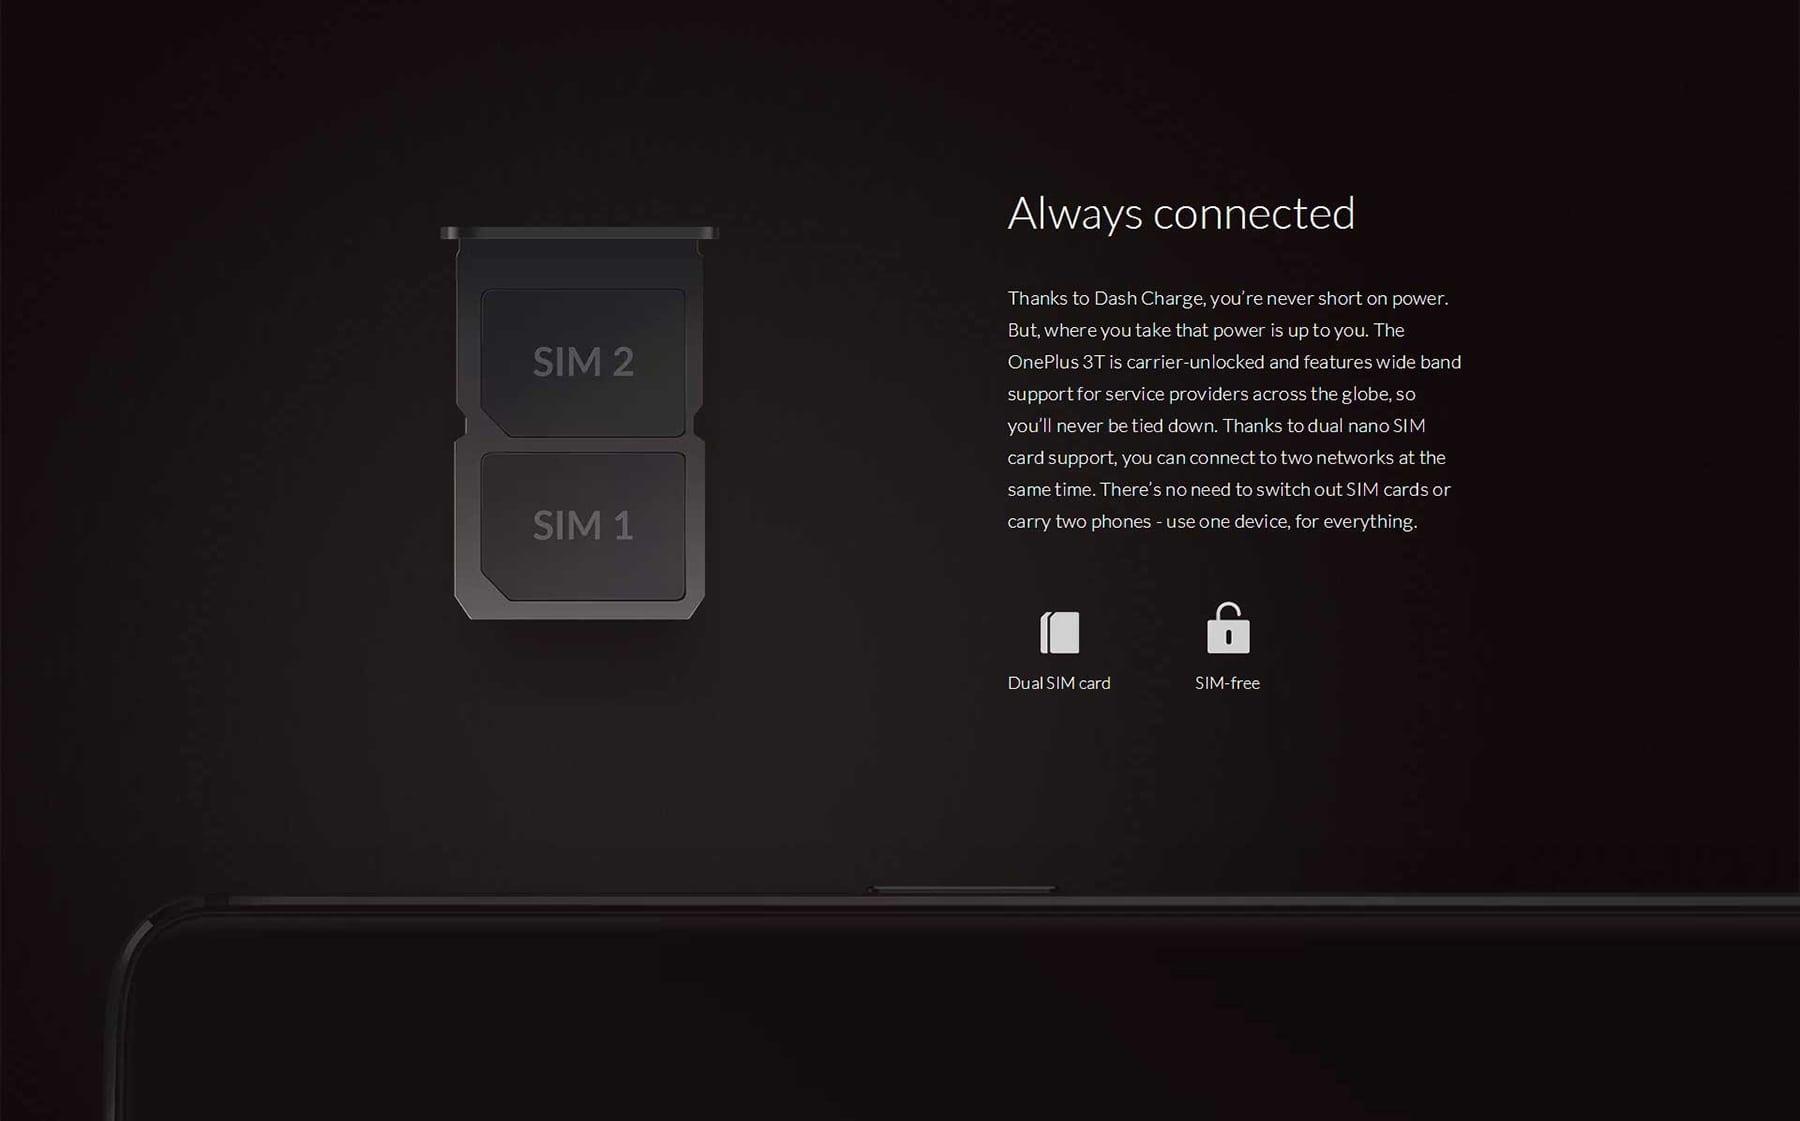 OnePlus 3T Dual SIM Review